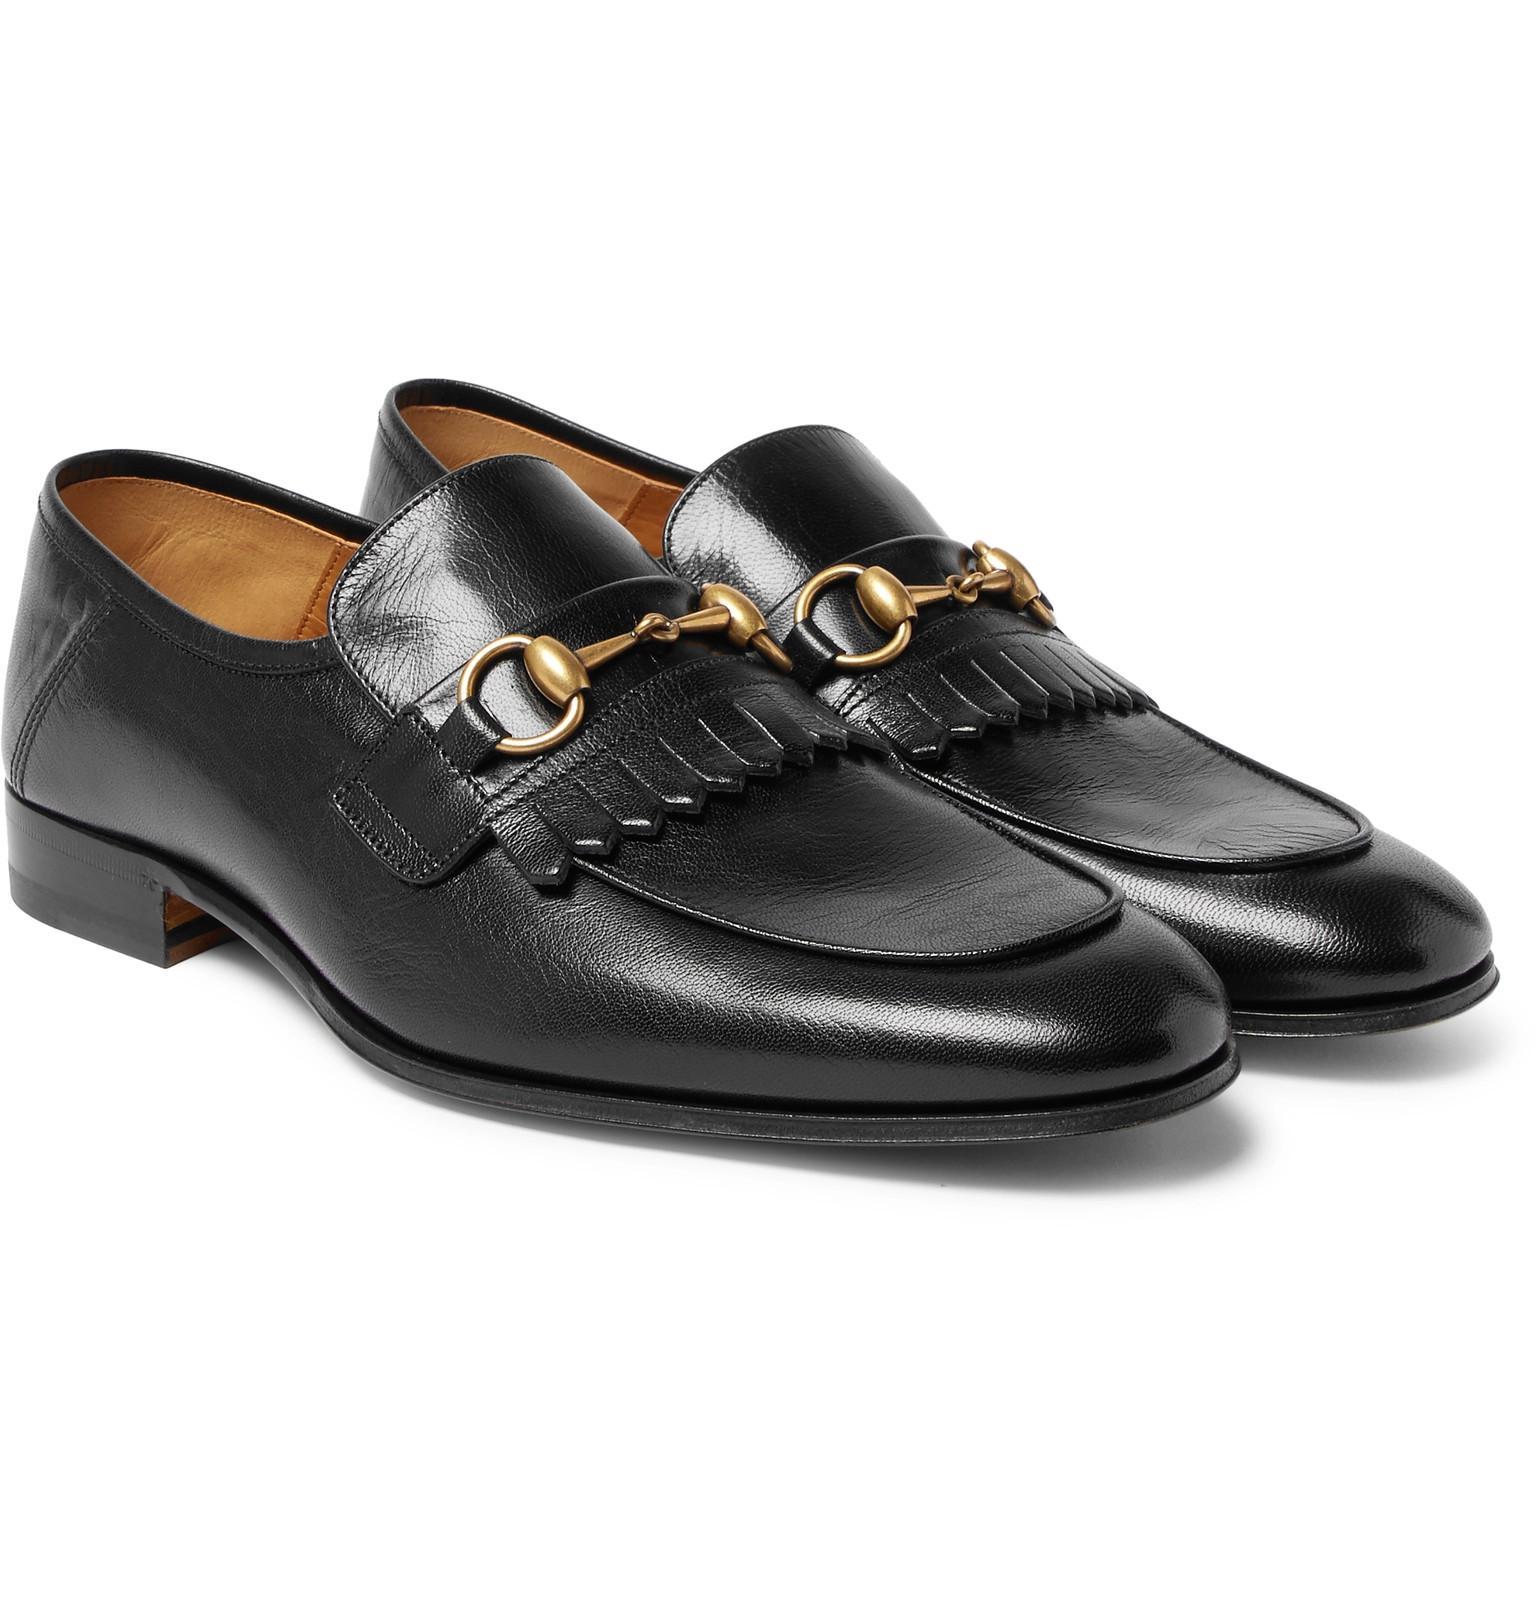 da51e39db10 Gucci Harbor Horsebit Fringed Leather Loafers in Black for Men - Lyst